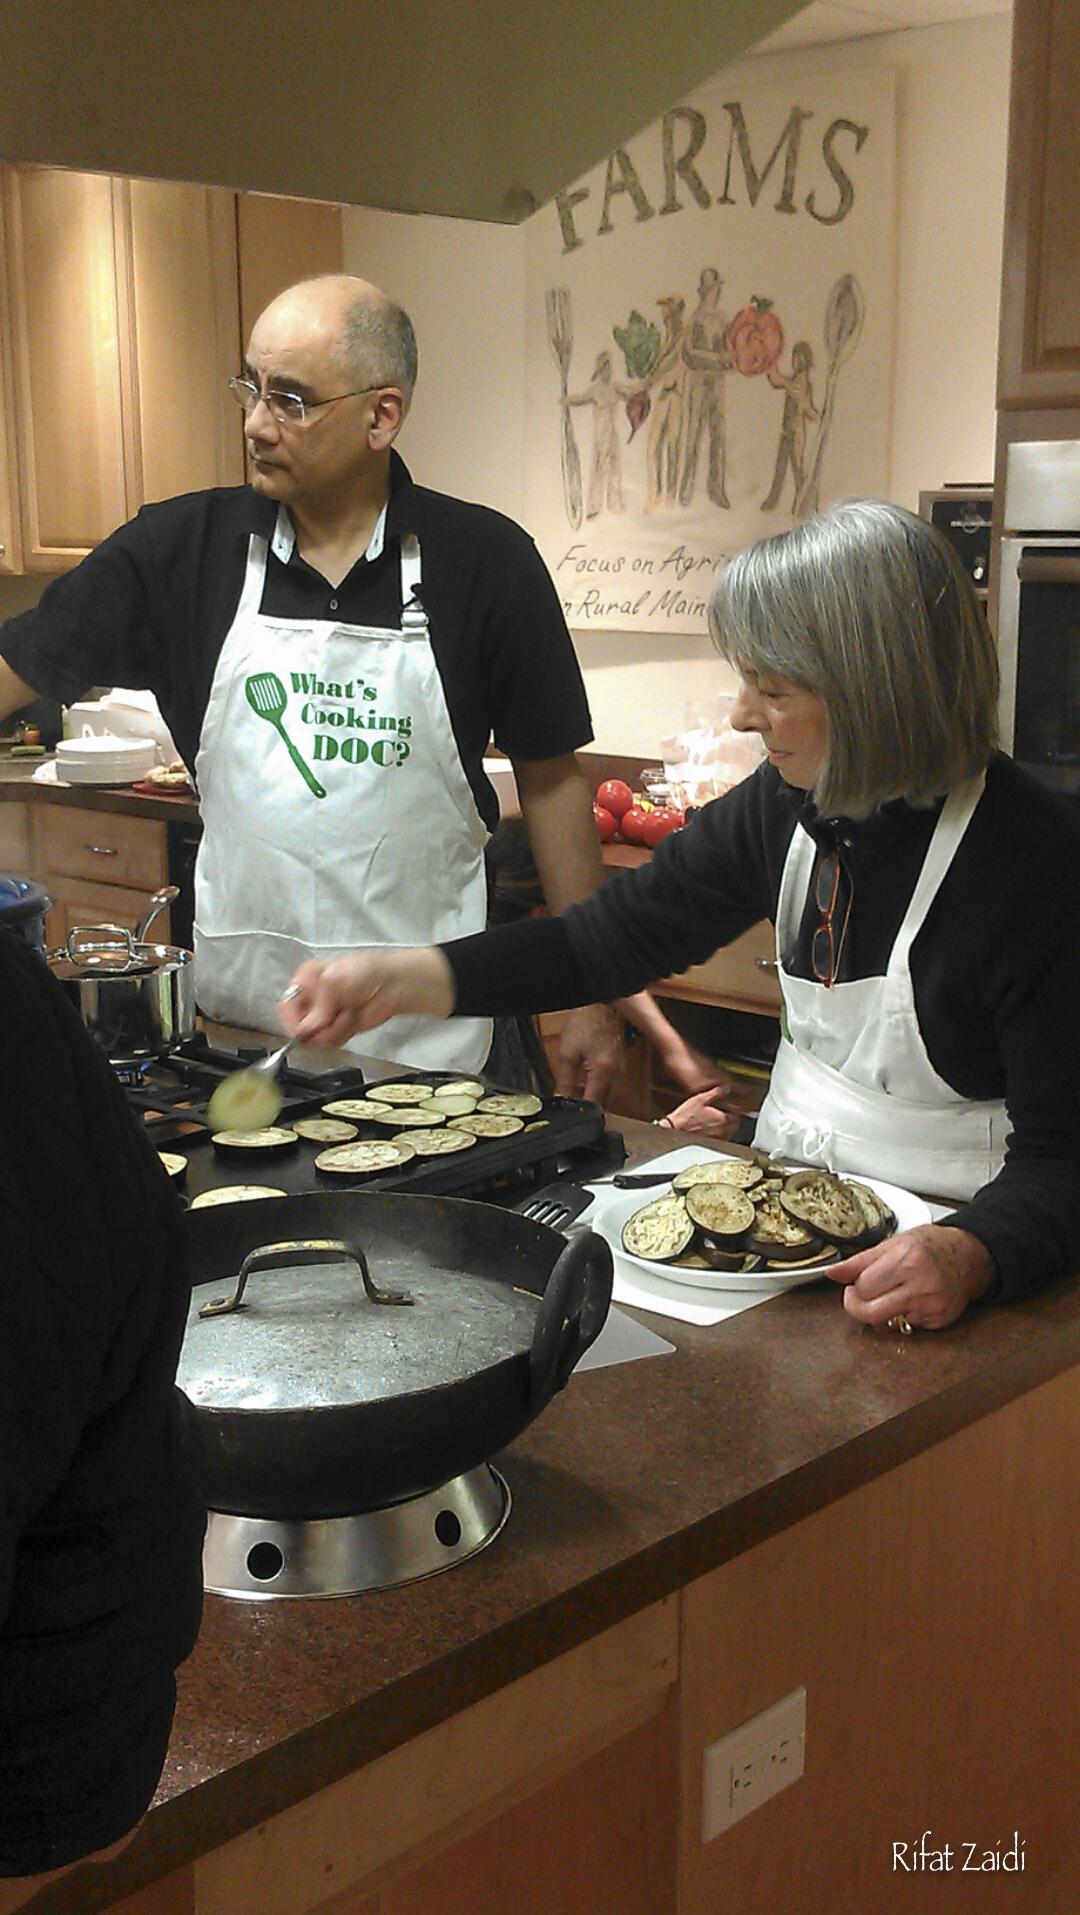 Roasting the eggplant slices